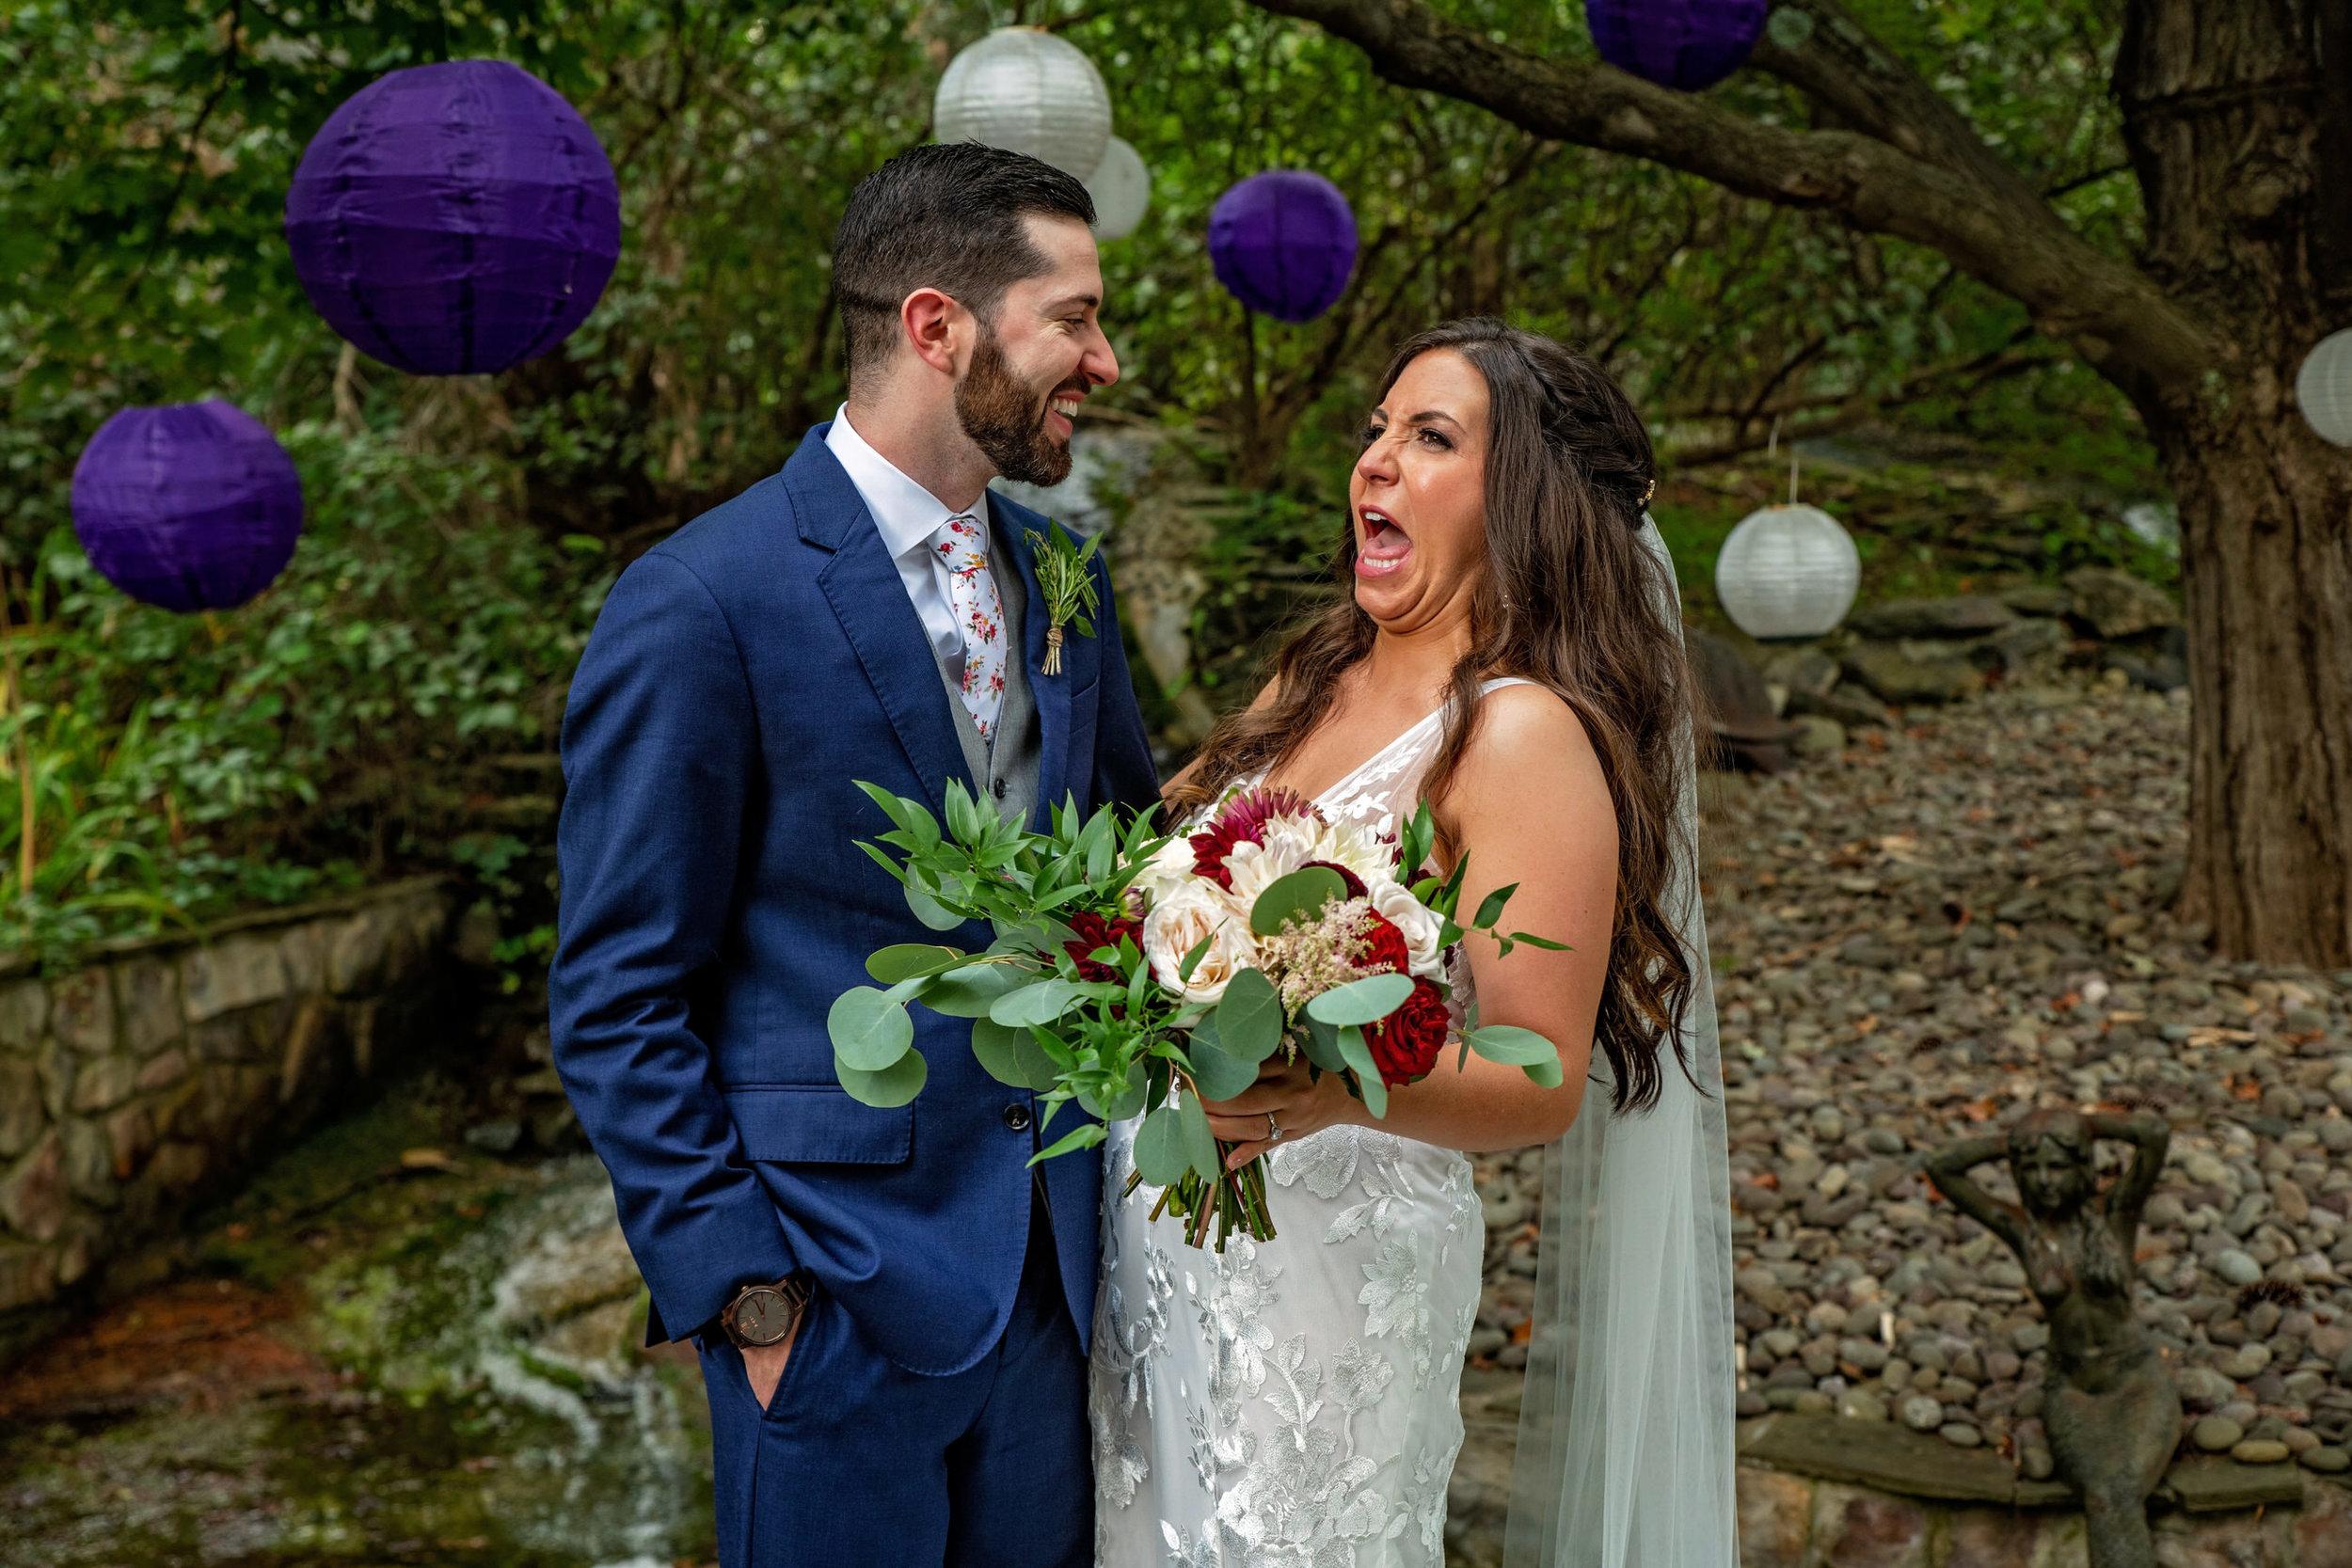 FeastCatering-Sara&Justin-WeddingParty-12.jpg